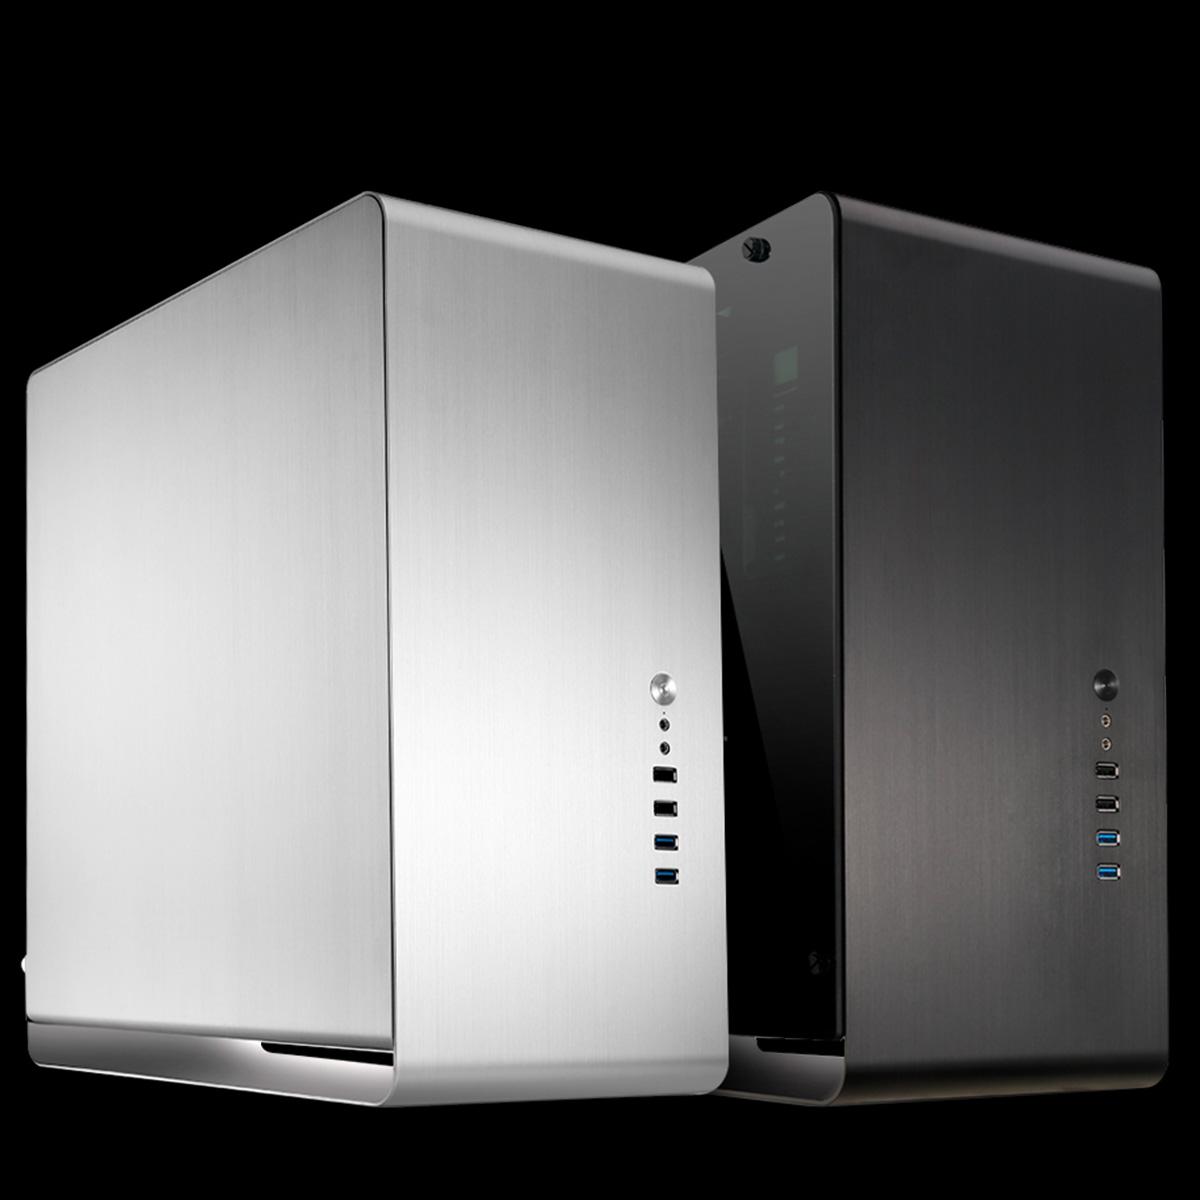 iClon X4